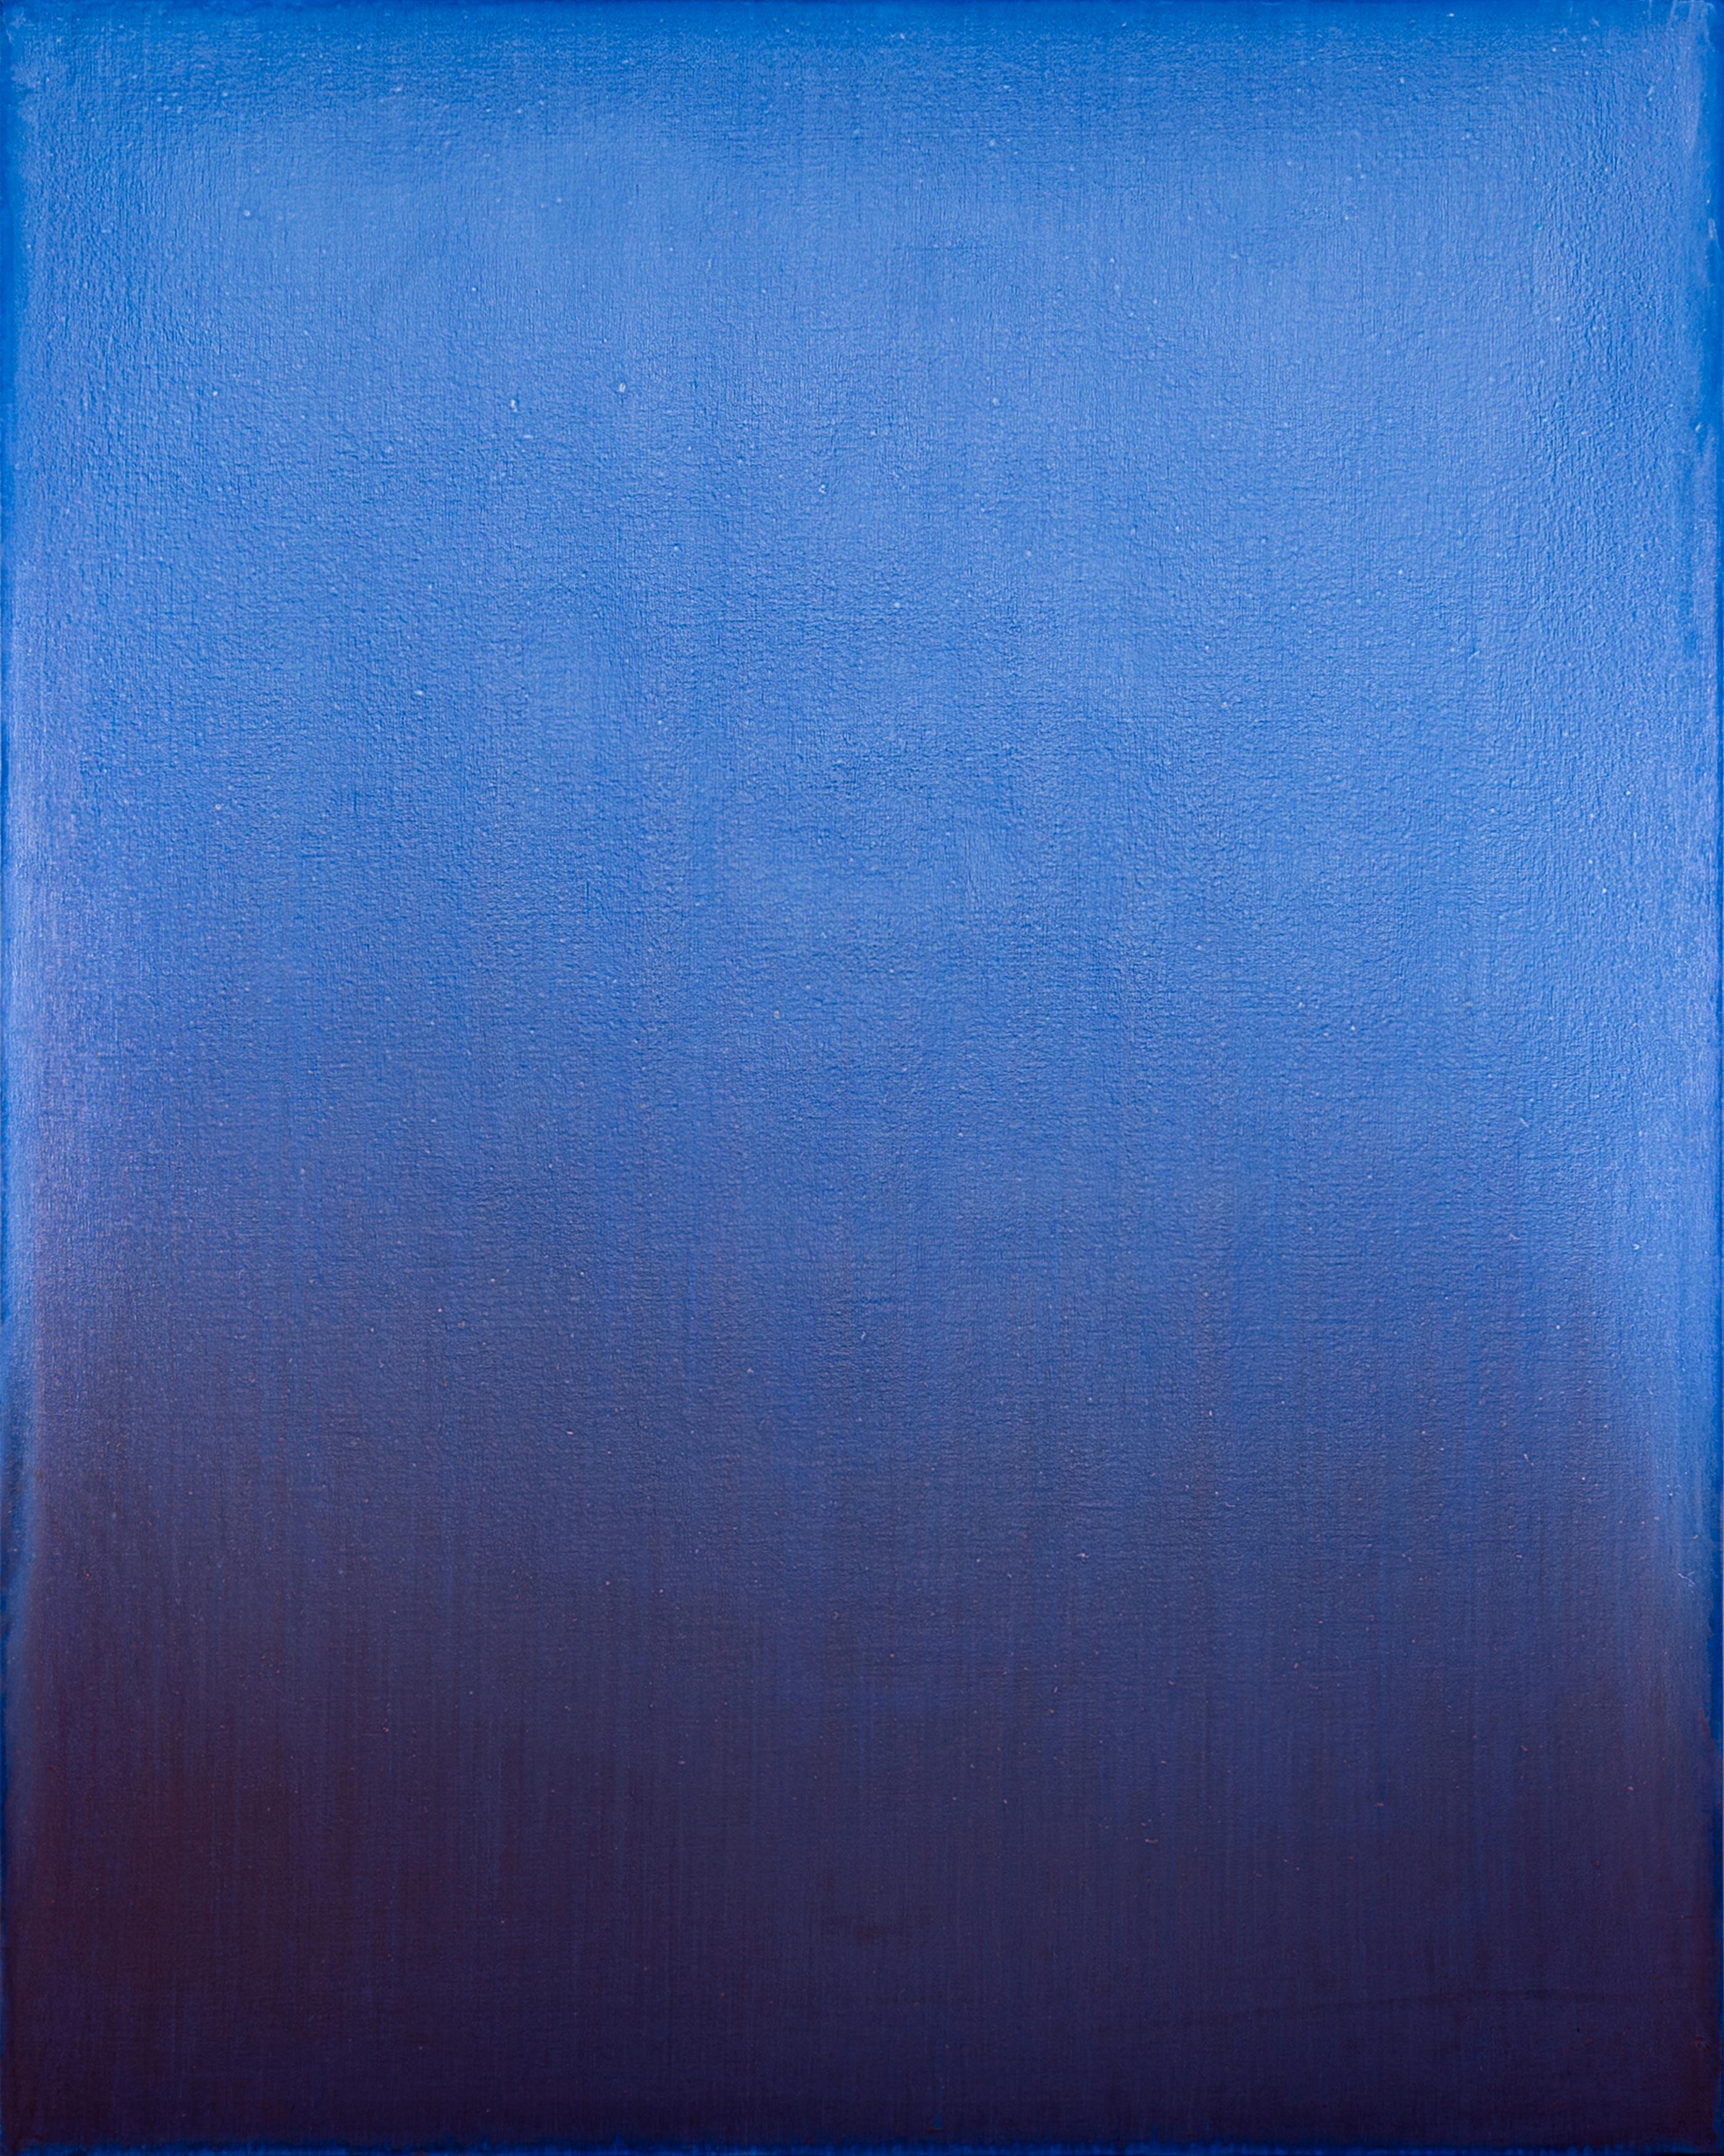 TW_Artwork_1524x1219_Large-Blend_LR